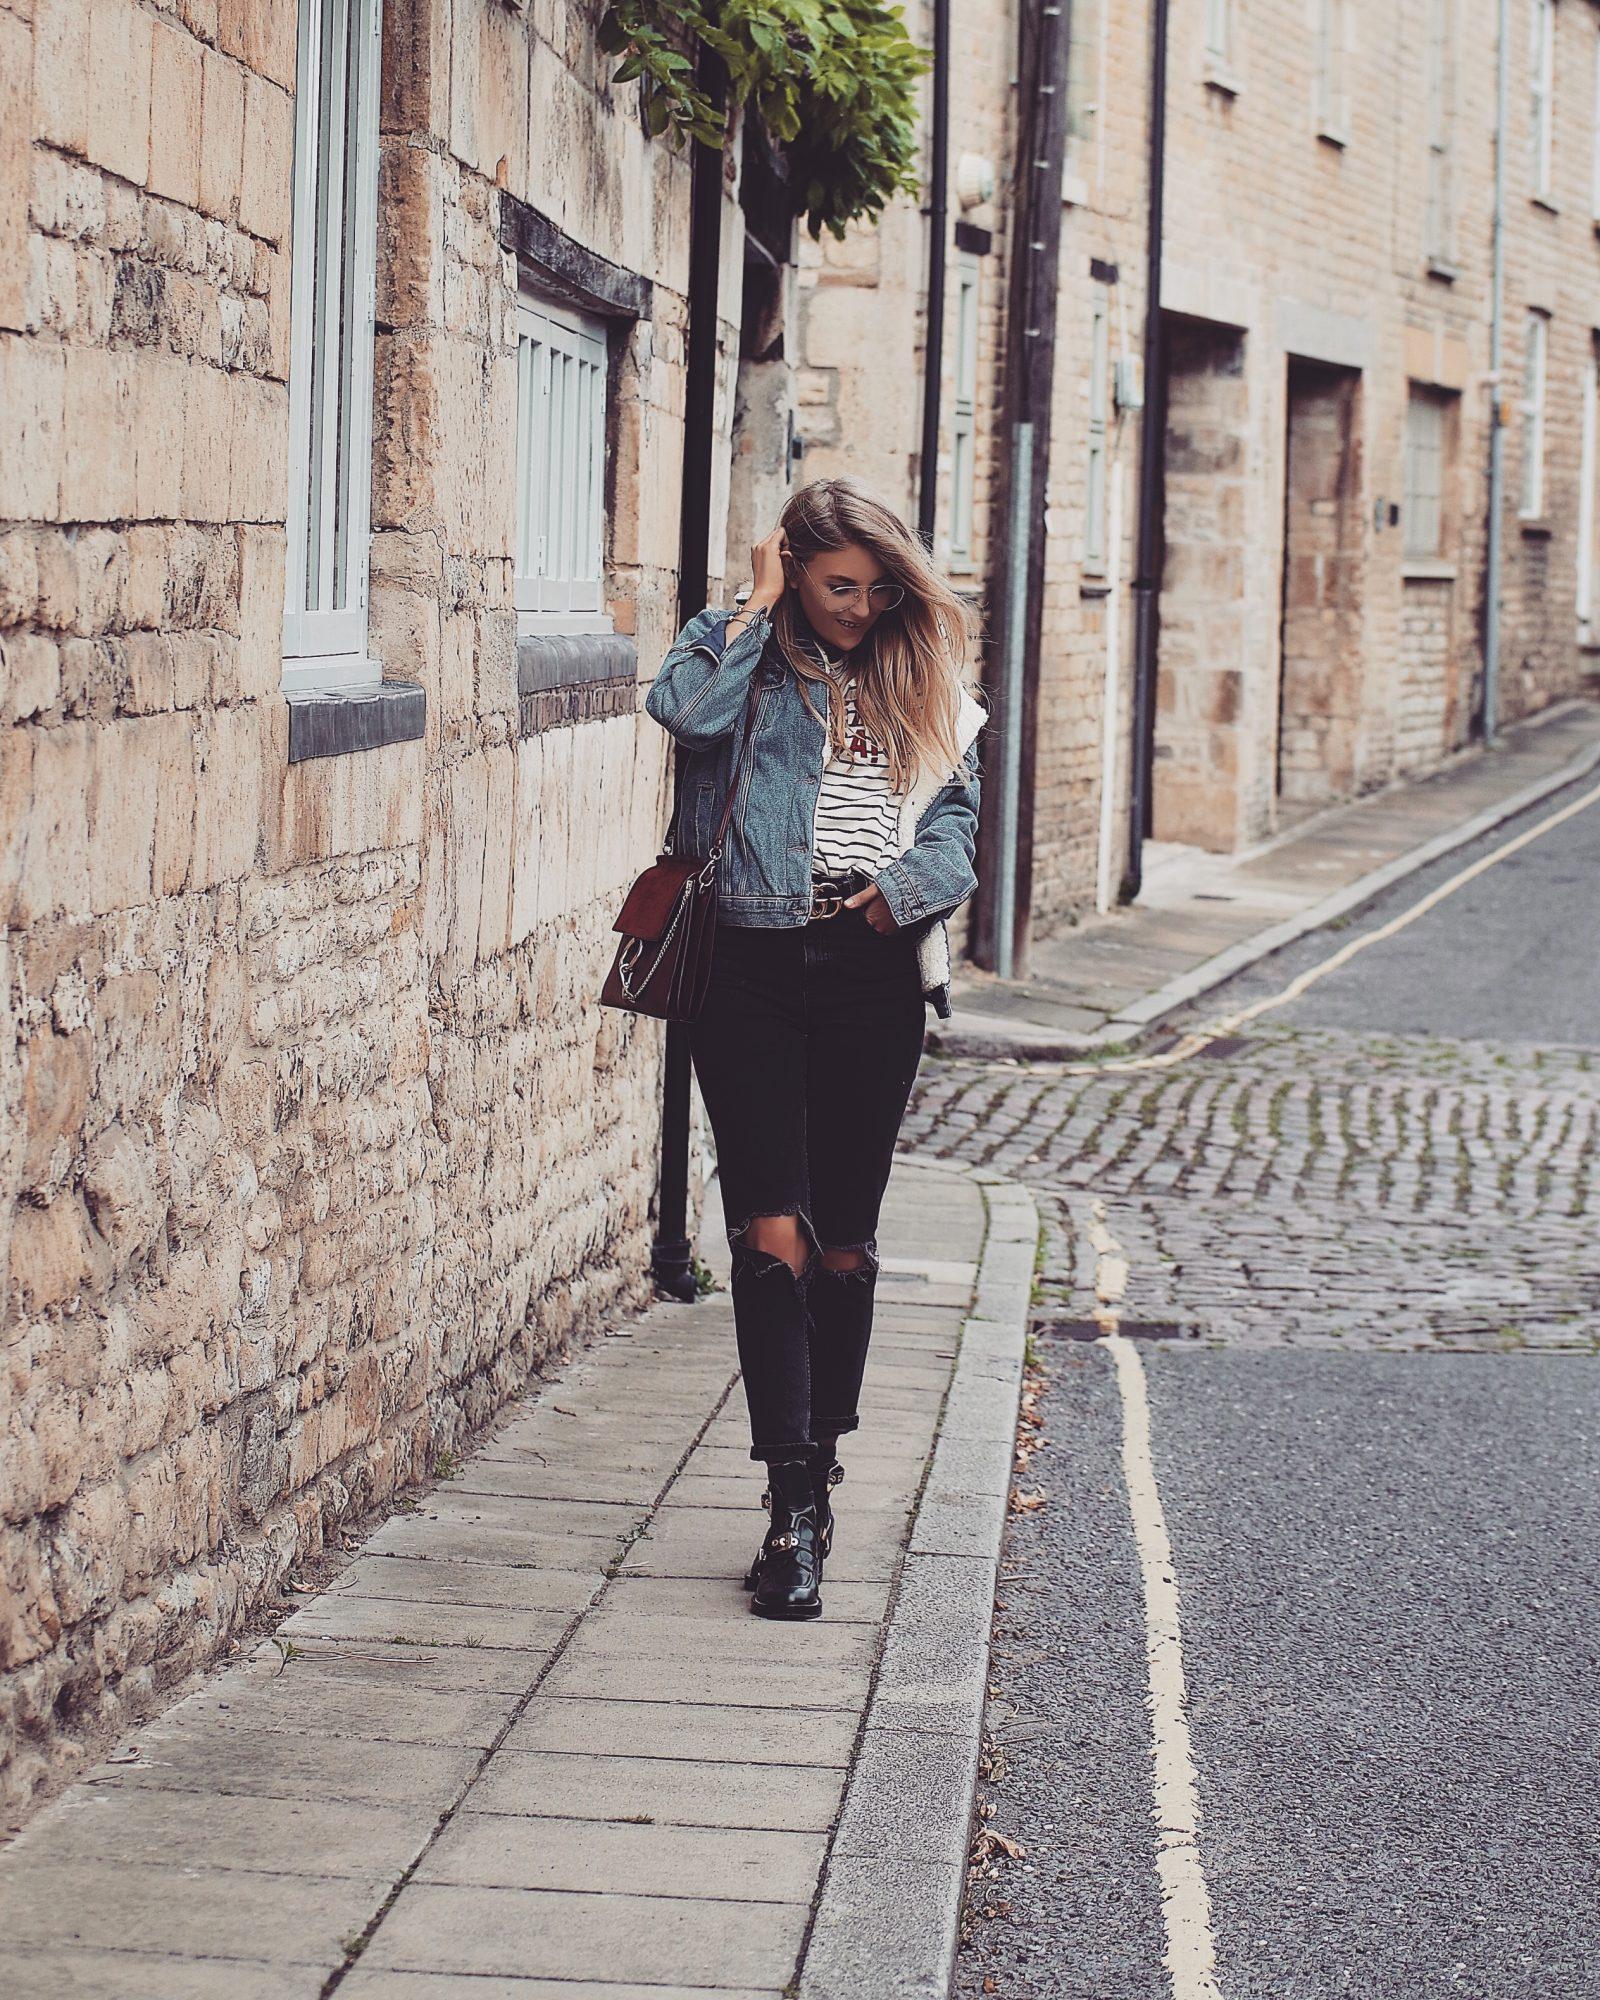 Denim Shearling Jacket - Outfit Inspiration